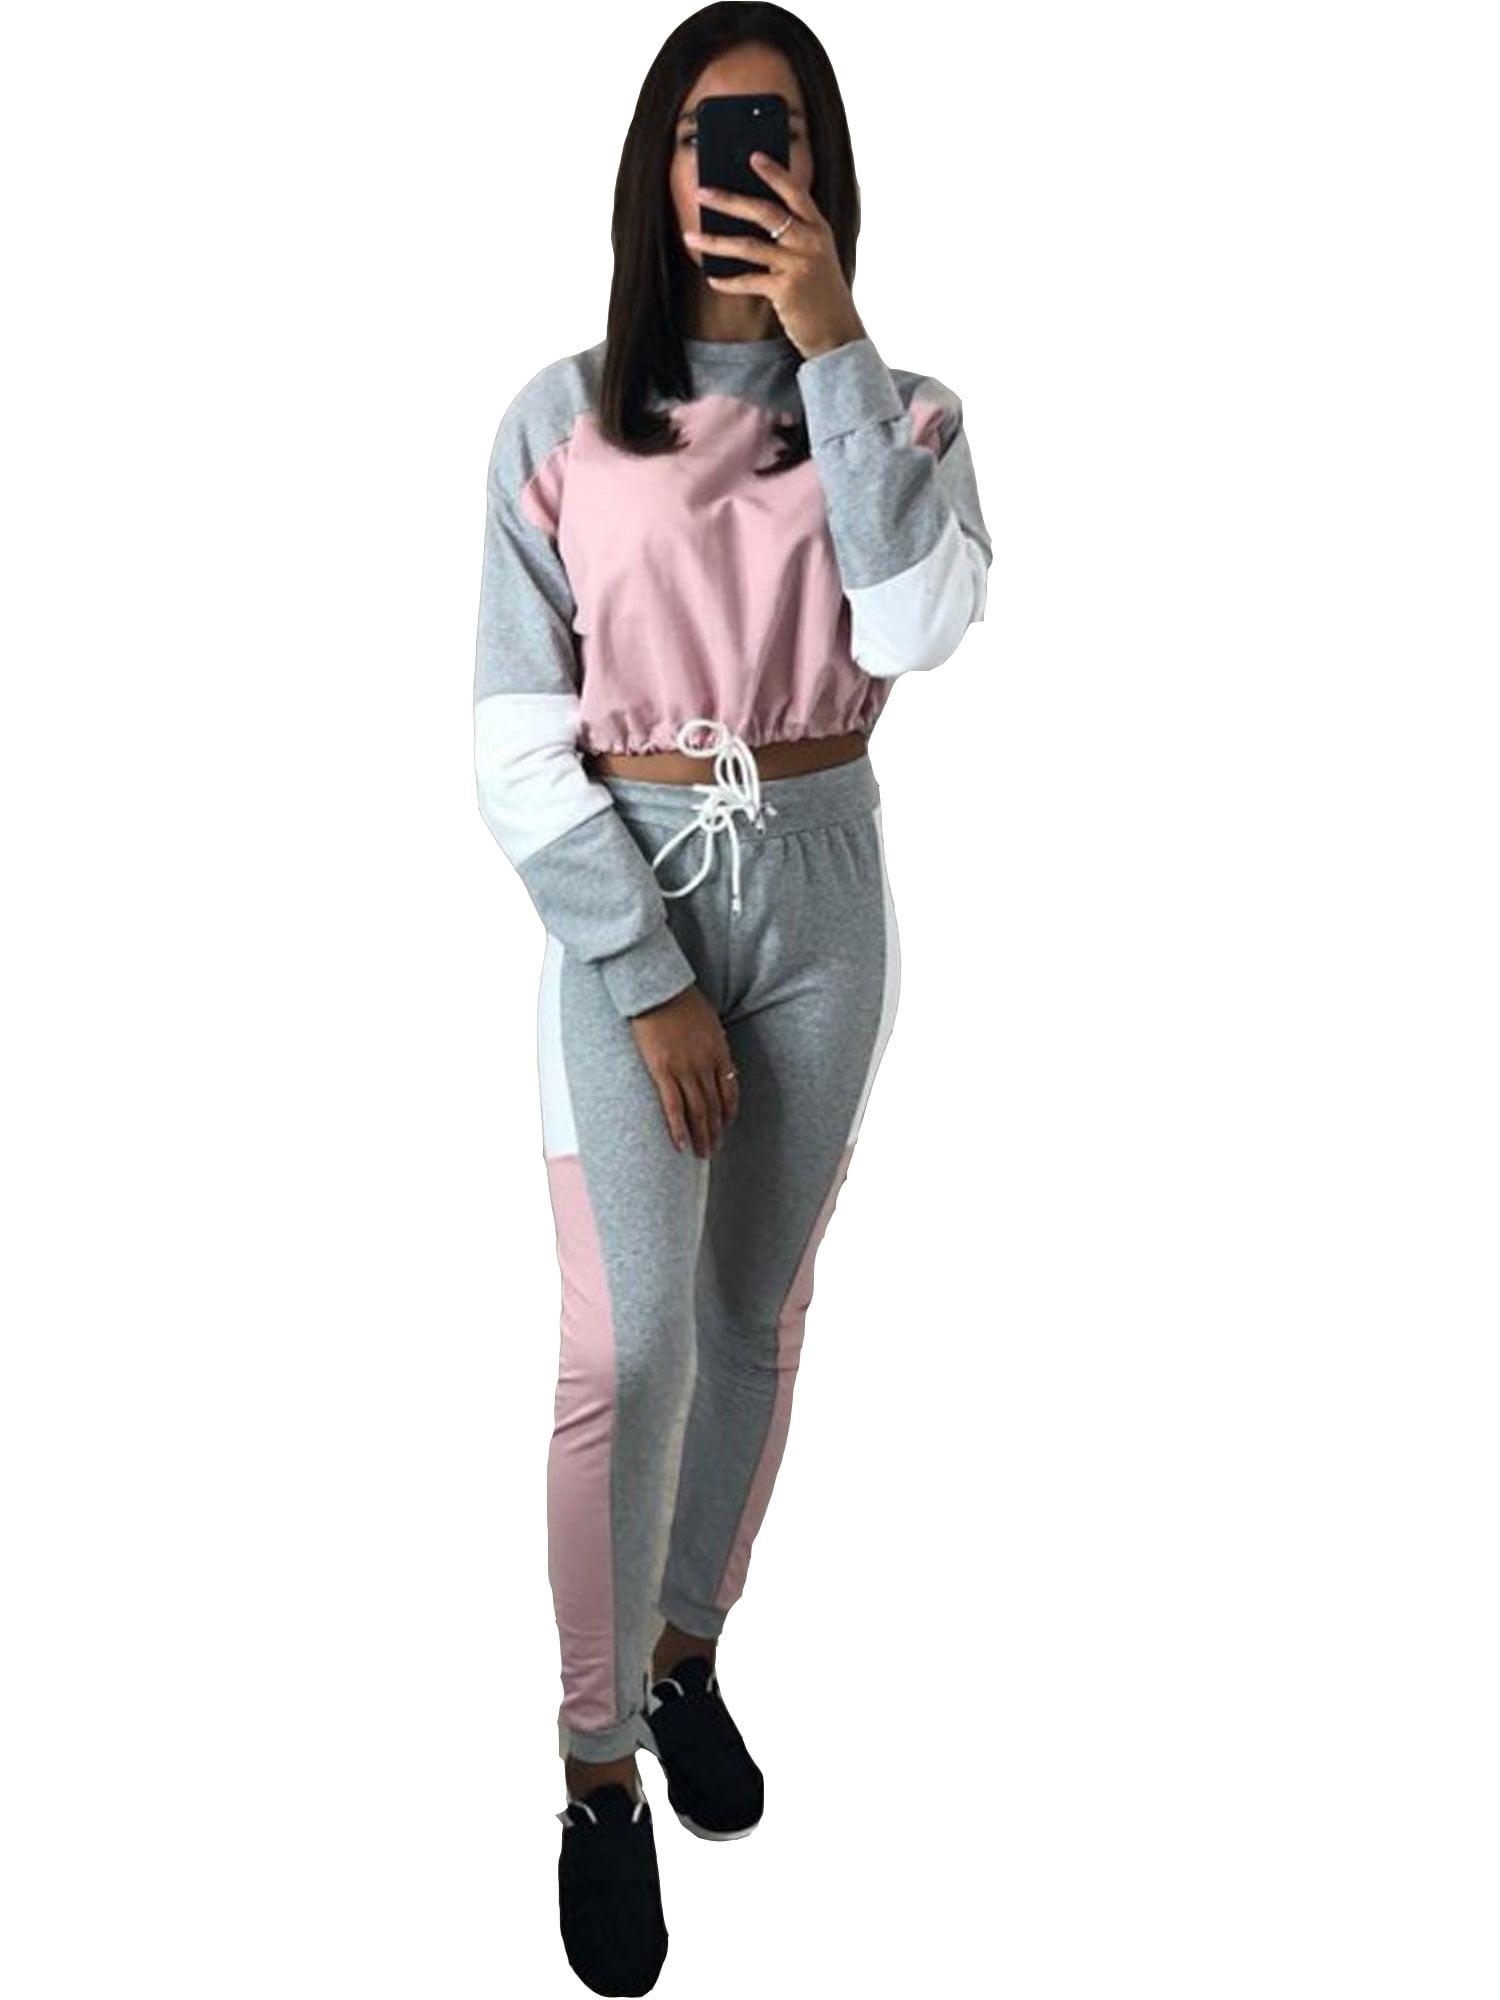 429bd7e4bb 2PCS Women's Activewear Tracksuits Sets Long Sleeve Sweatshirt Crop Top  Pants Outfits Lounge Wear Patchwork Gym Jogging Sportswear Joggers Casual  Suit